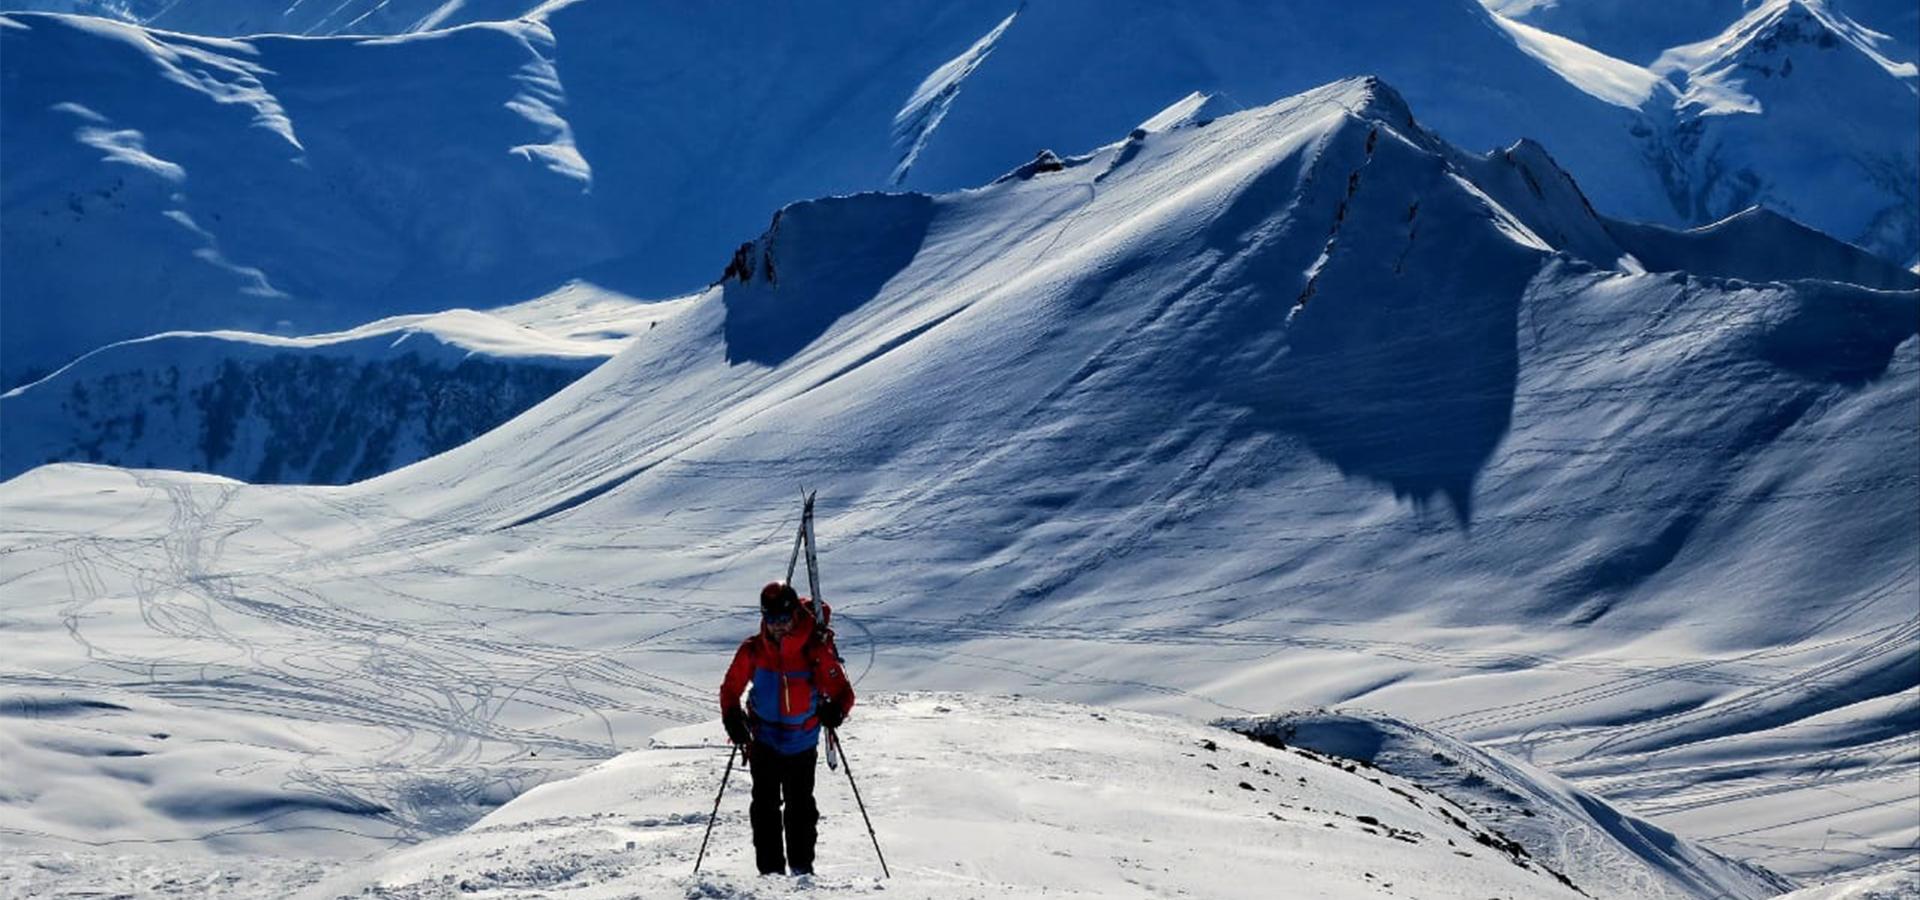 Image Credits George Saado - Skitouring in georgia